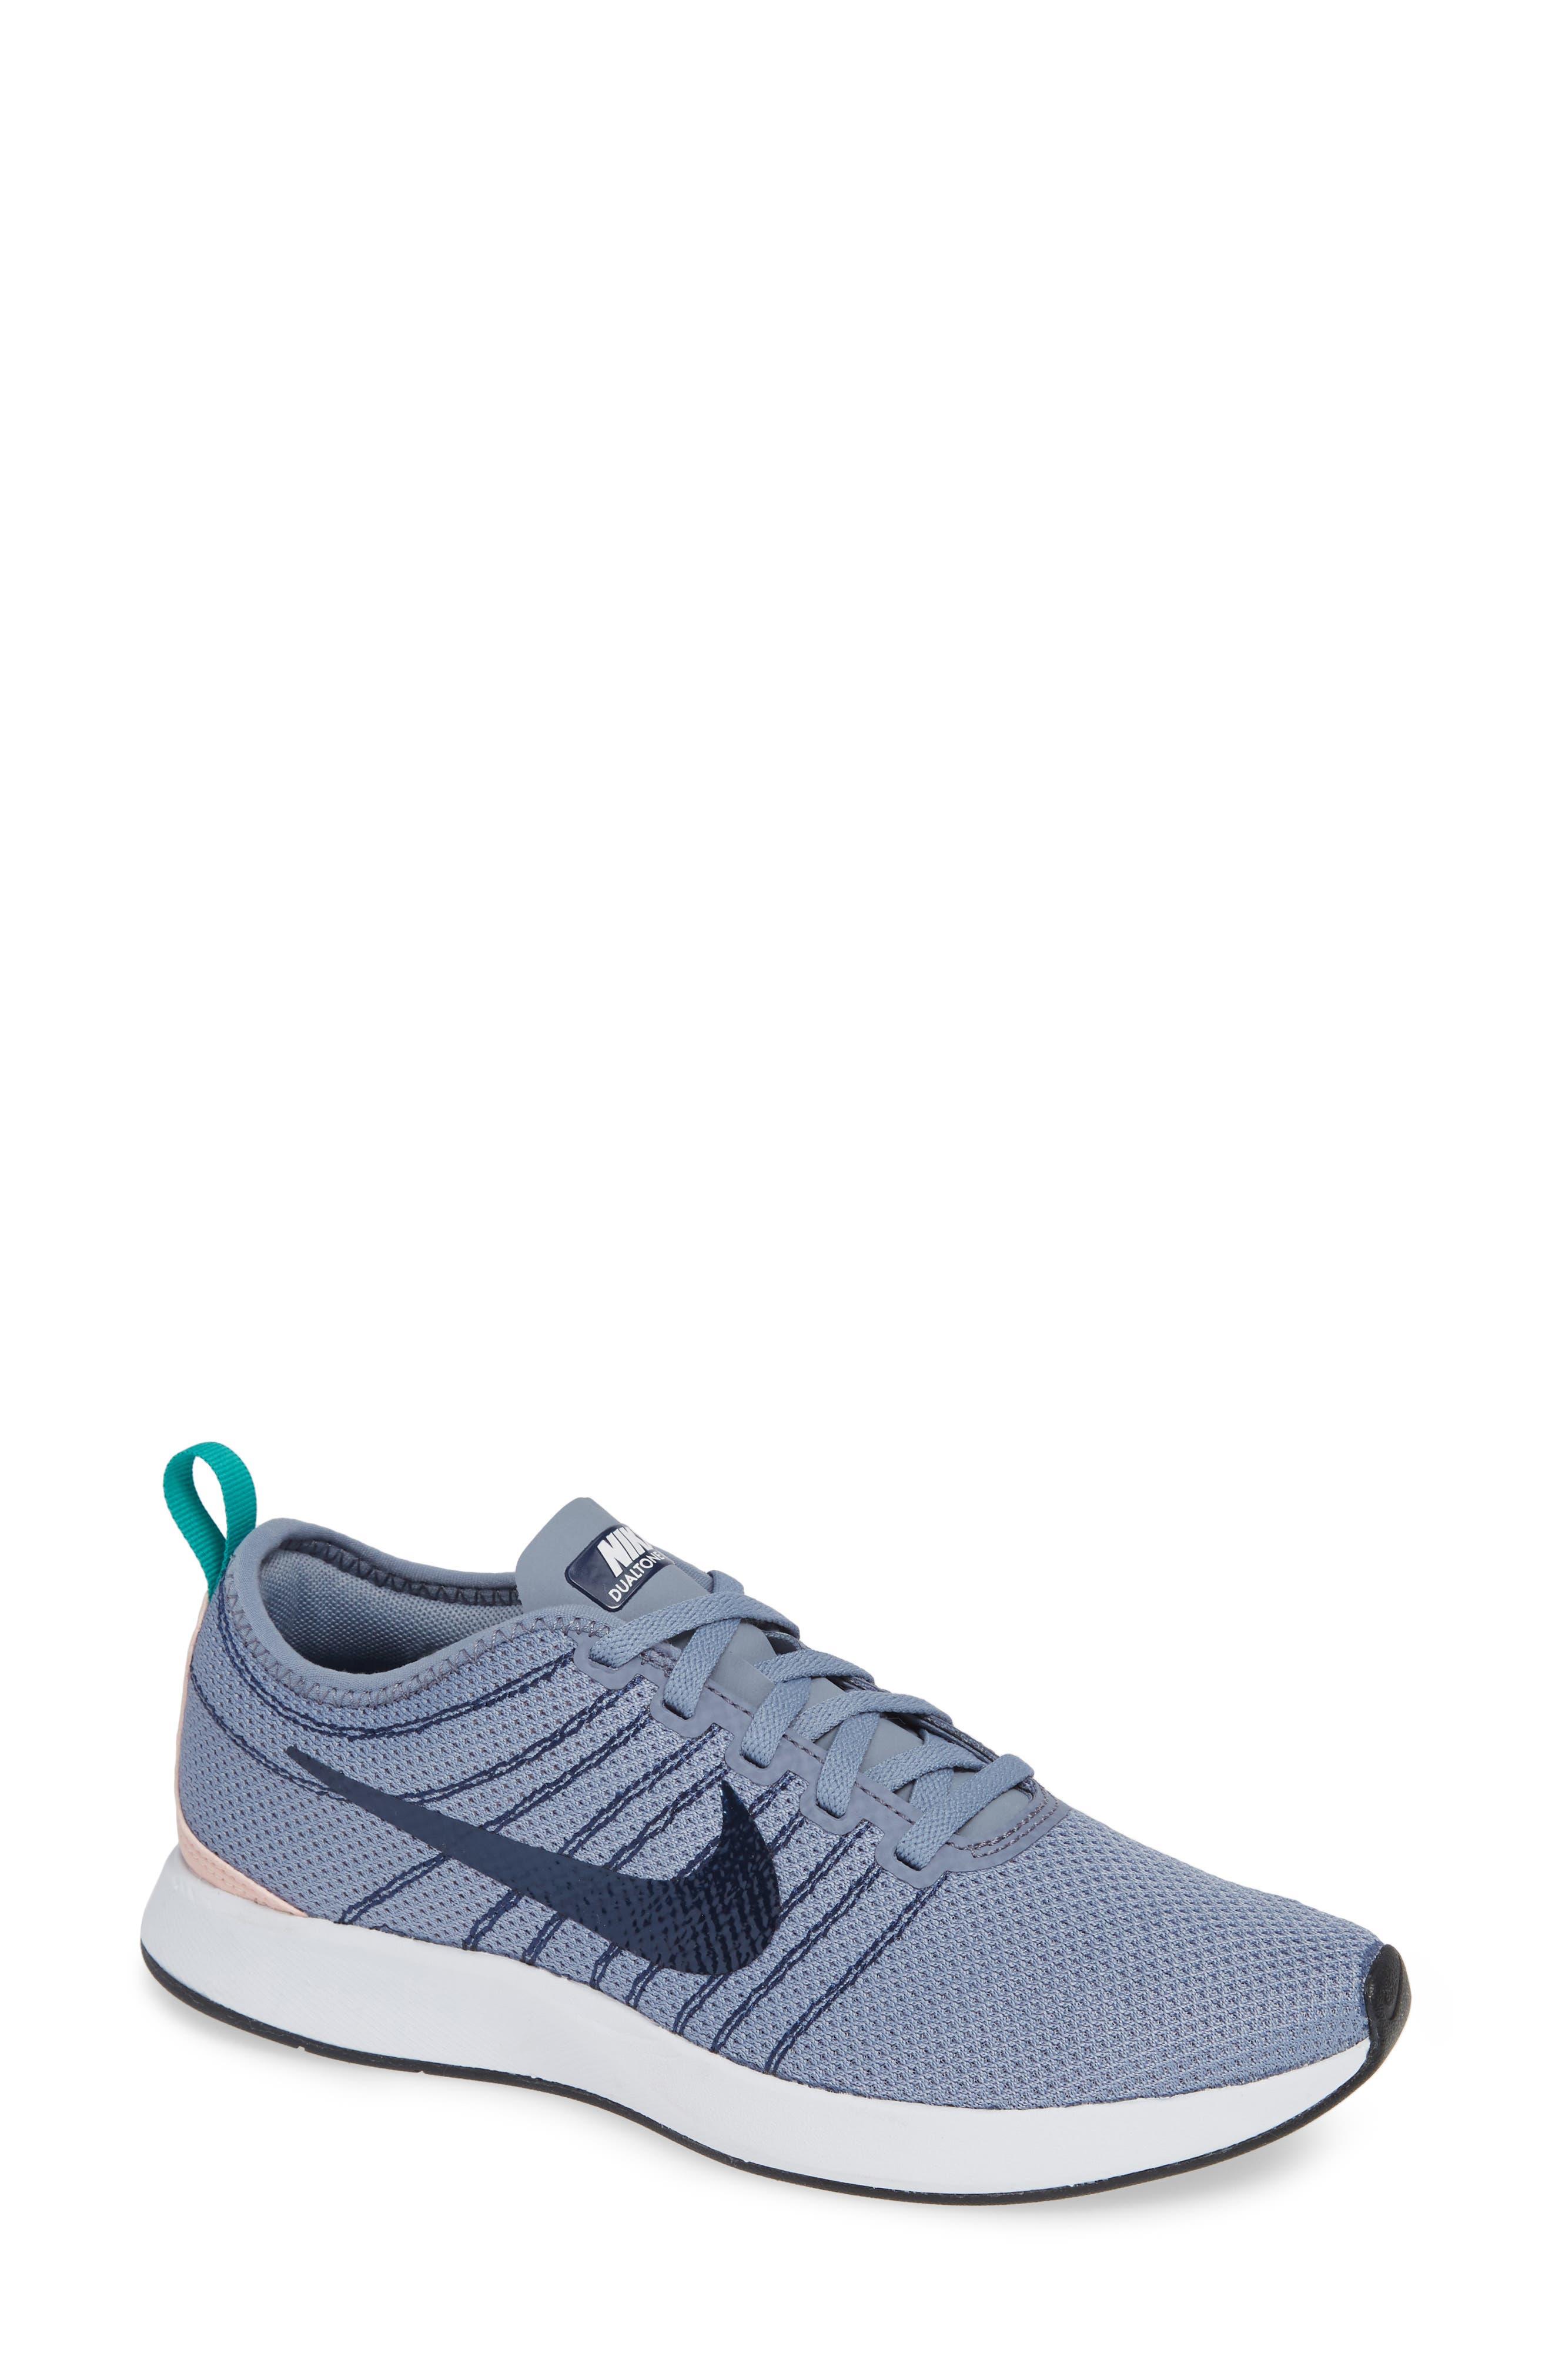 Dualtone Racer Running Shoe,                             Main thumbnail 1, color,                             ASHEN SLATE/ NAVY/ STORM PINK